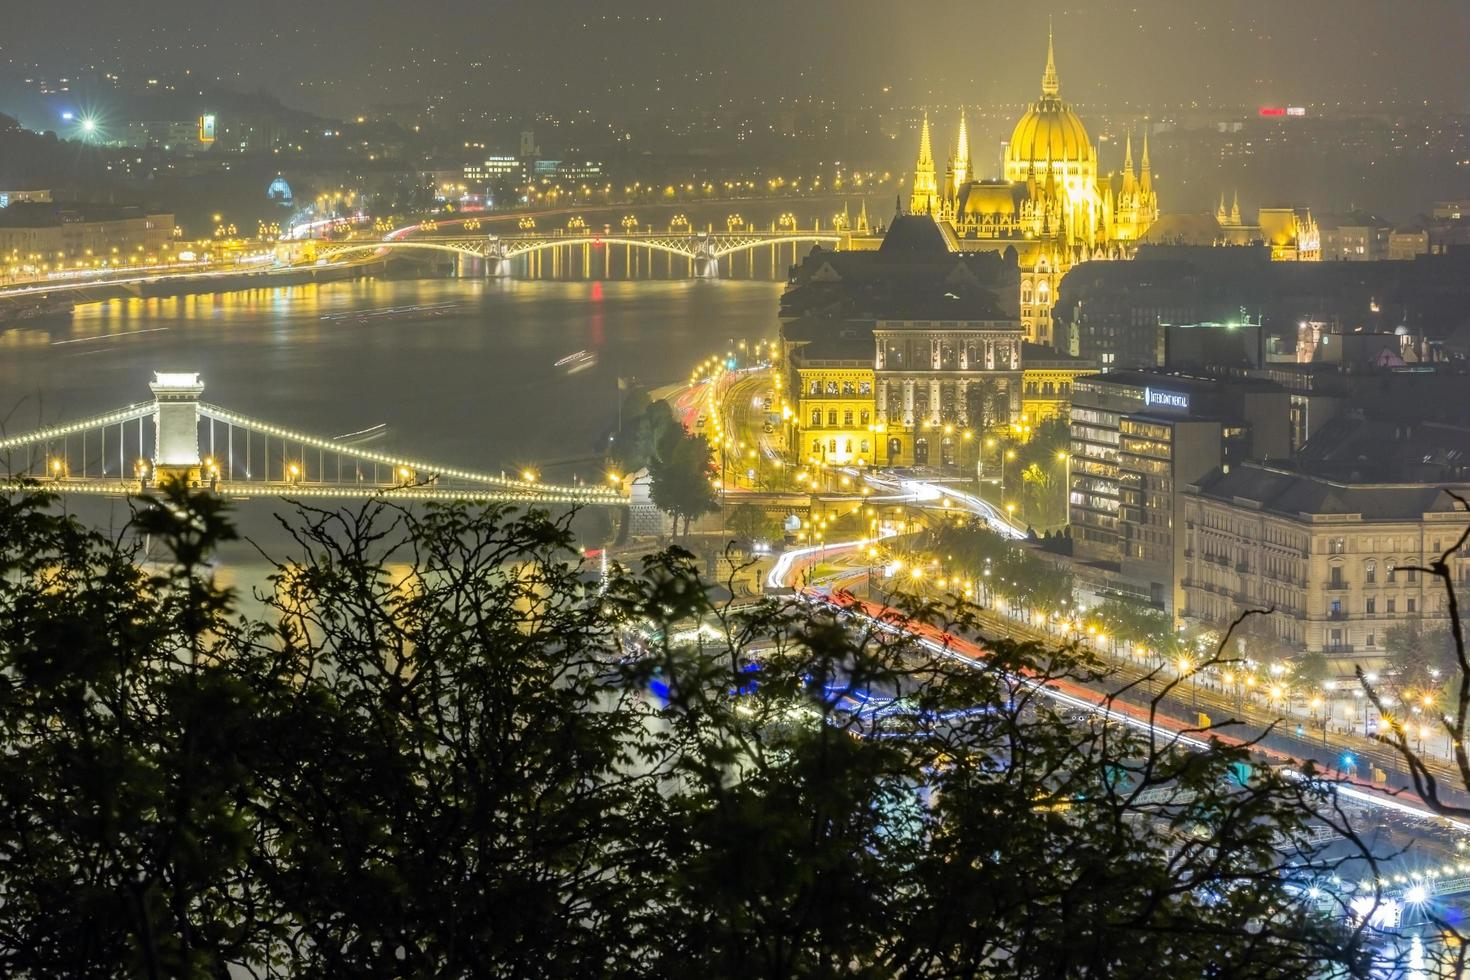 luchtfoto nacht uitzicht op de stad Boedapest foto